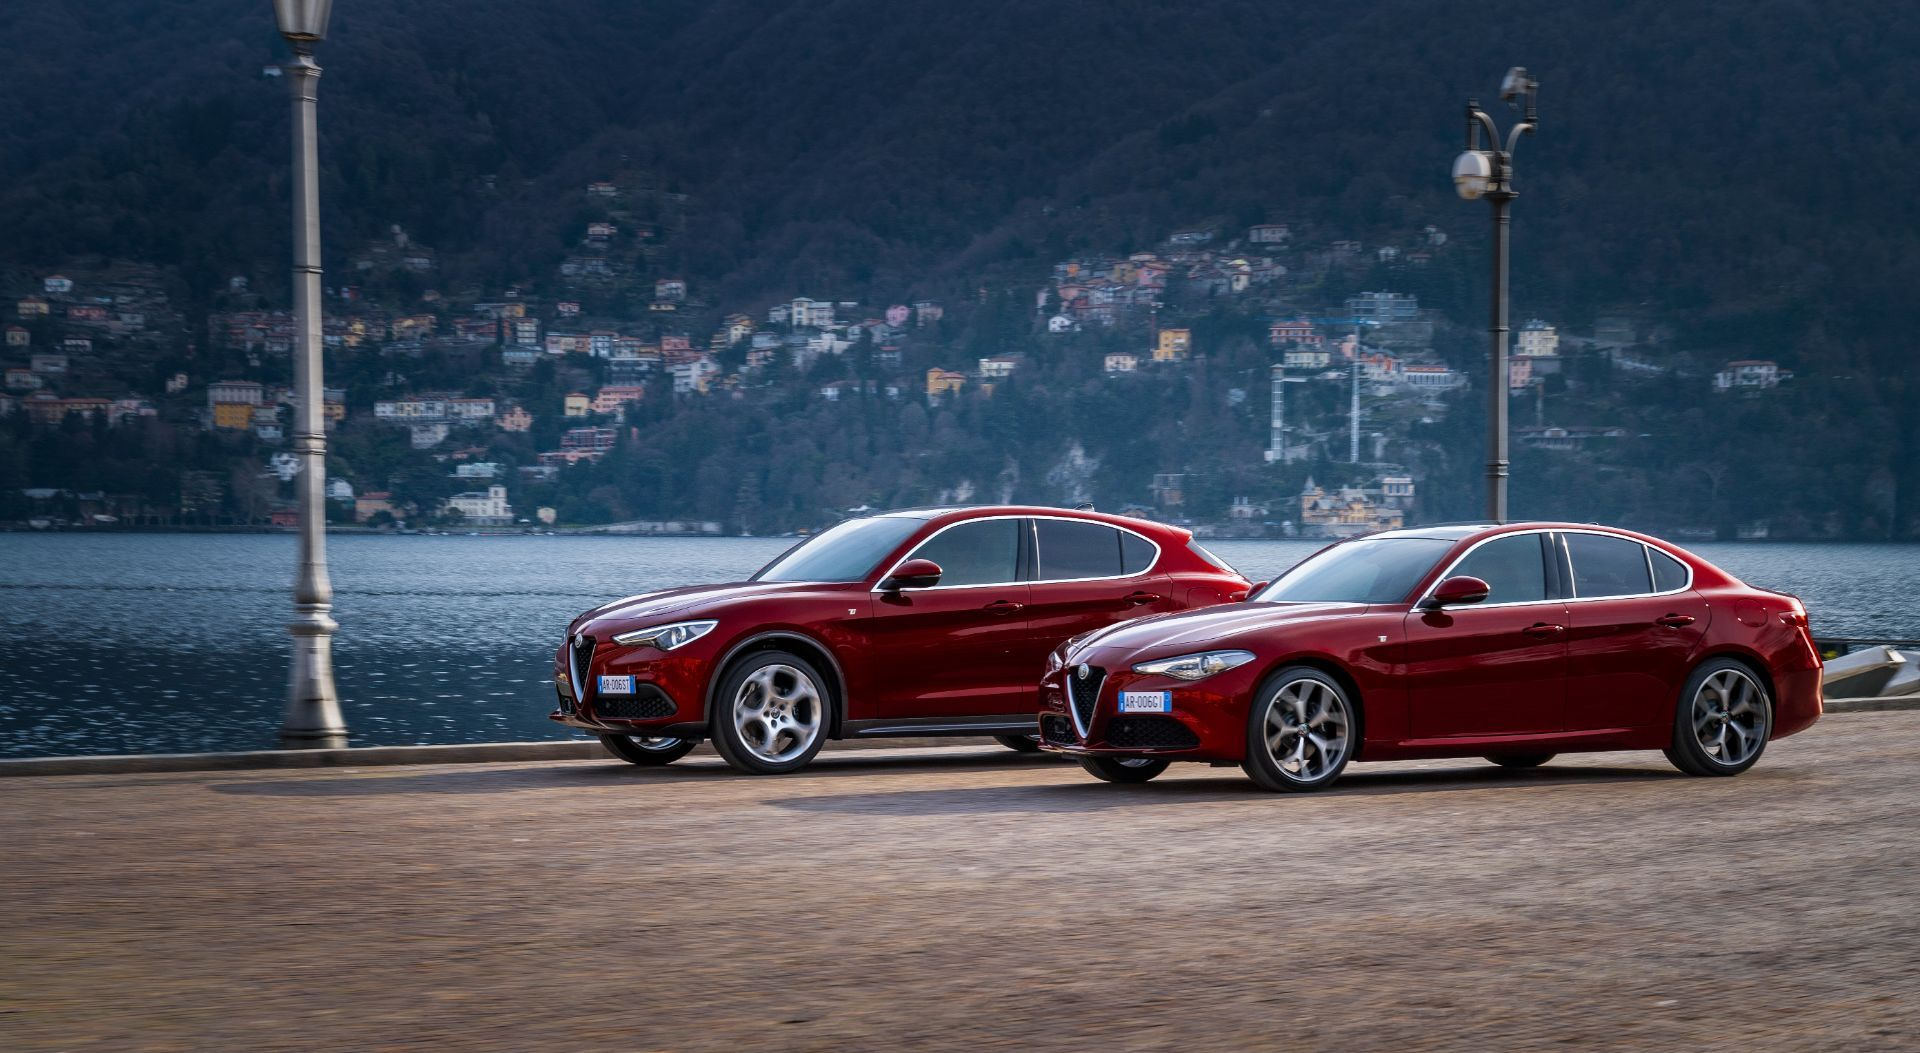 Alfa-Romeo-Giulia-and-Stelvio-6C-Villa-dEste-3